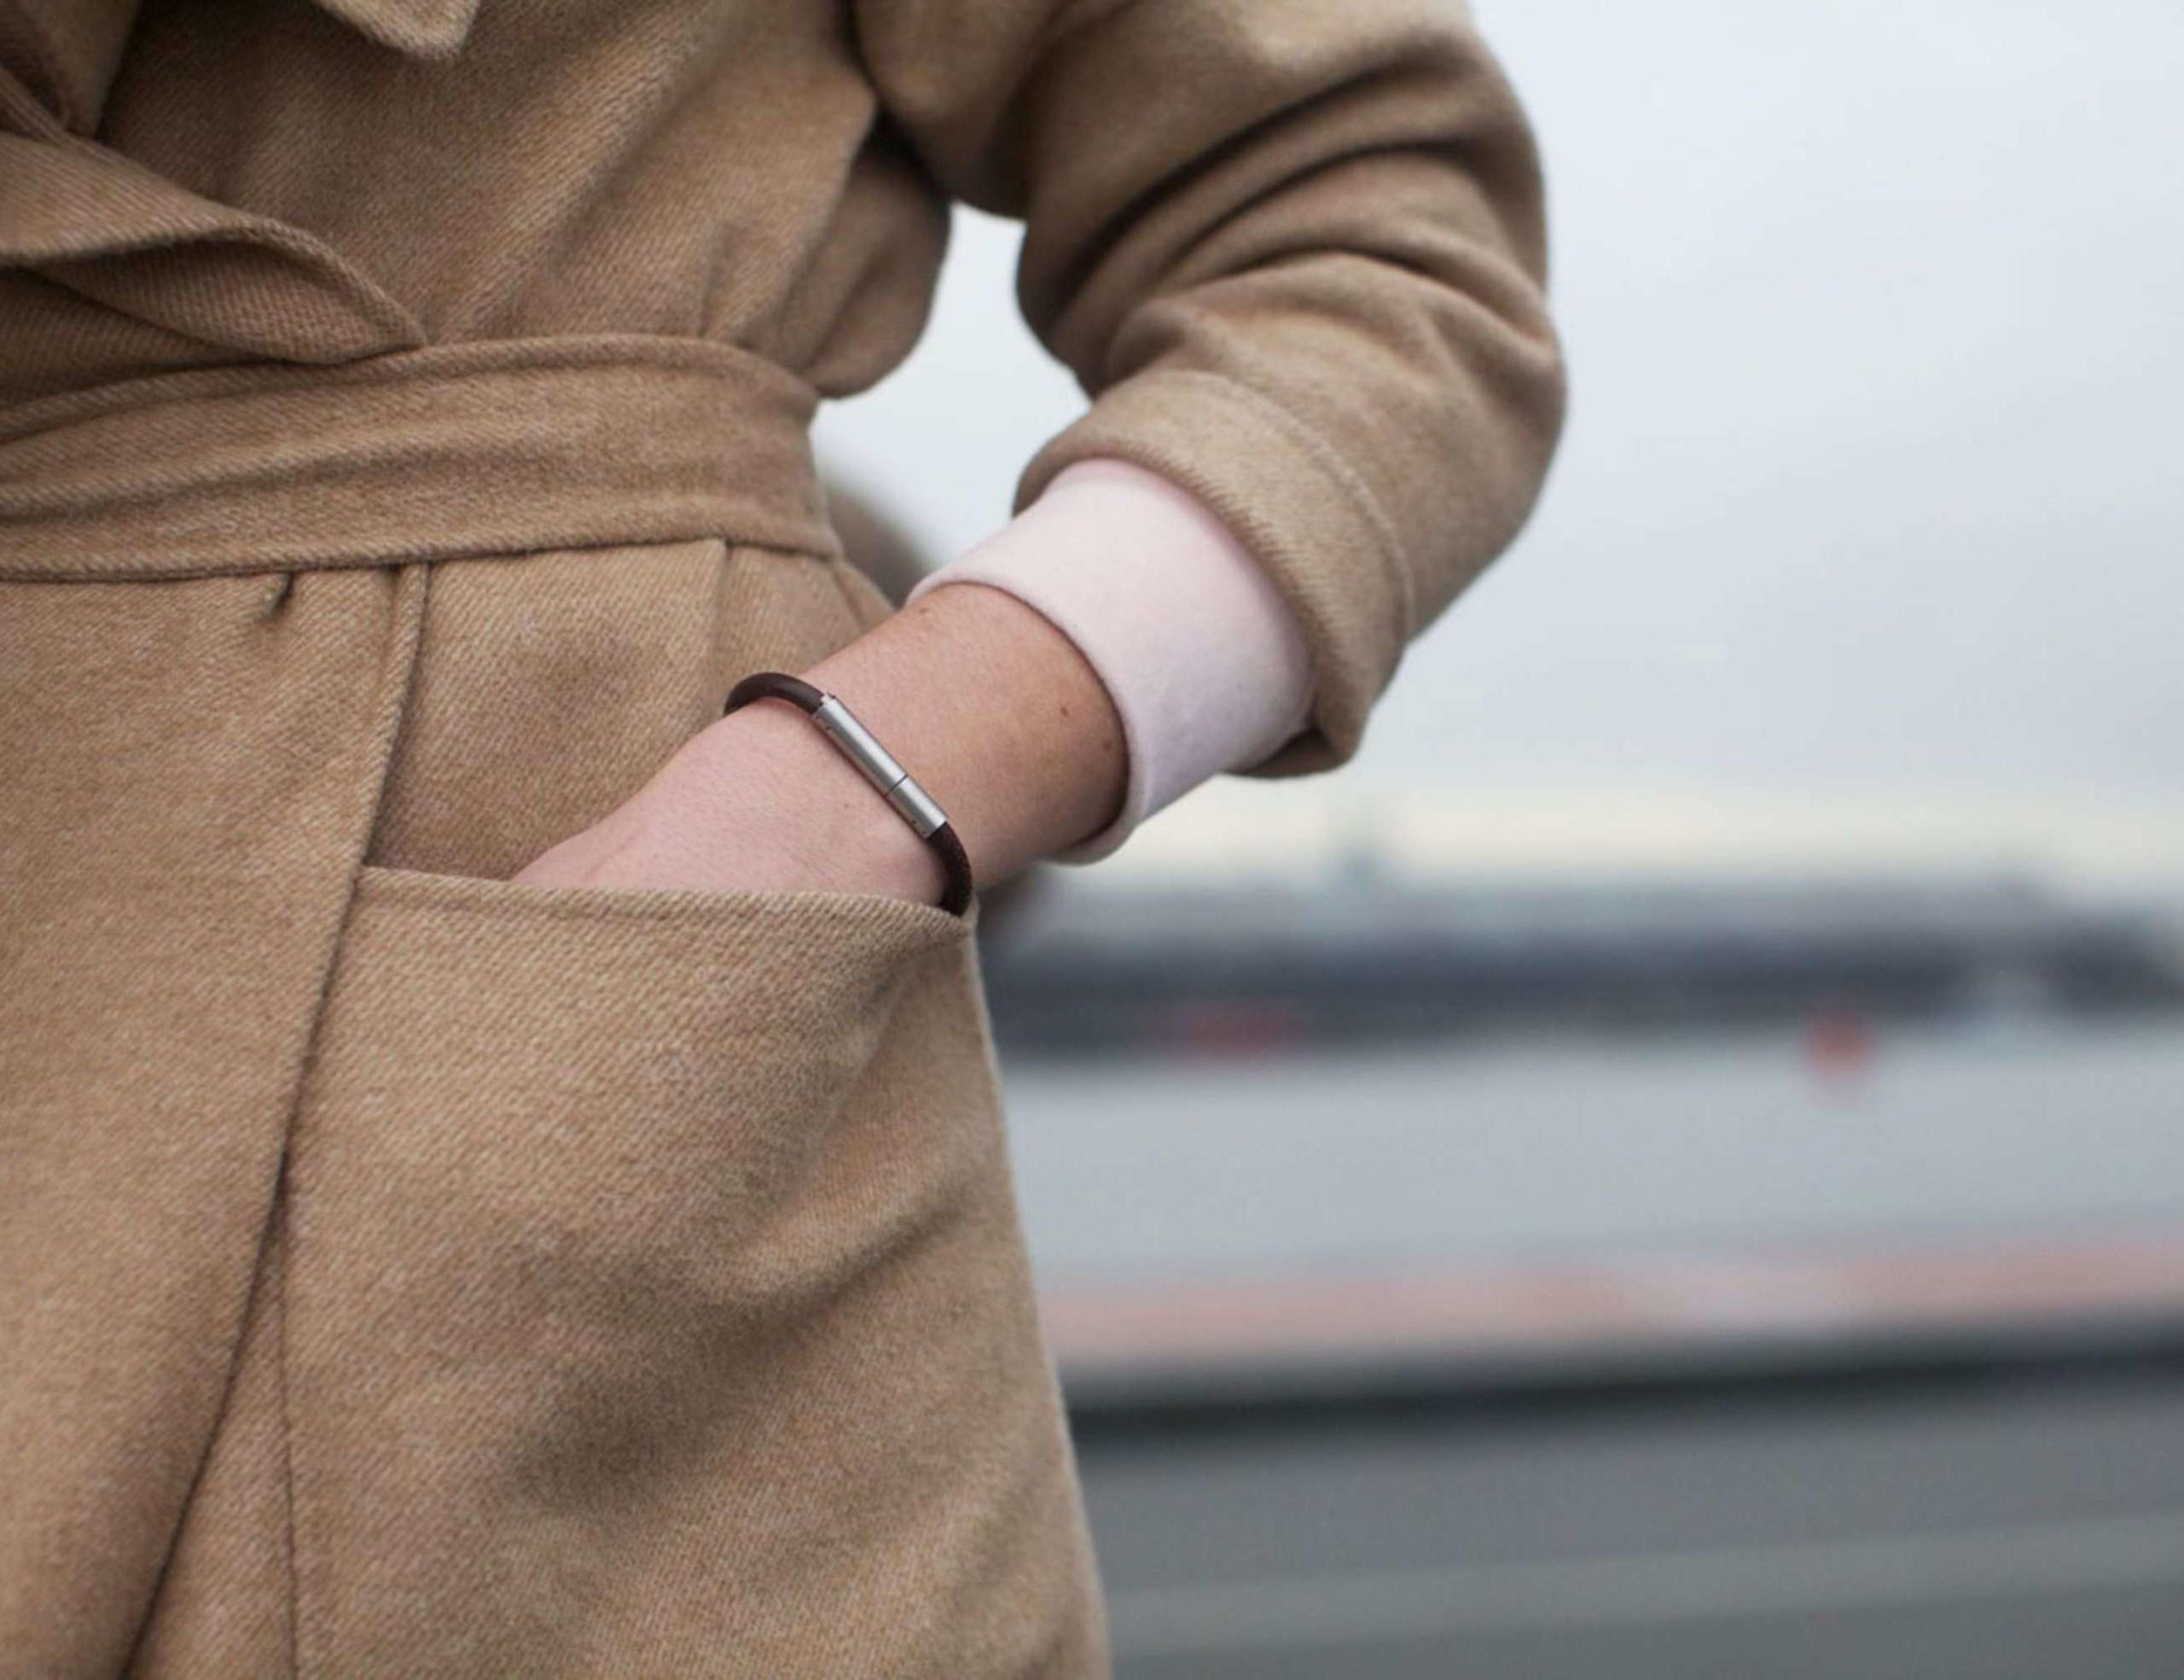 Invi Stylish Self-Defense Bracelet